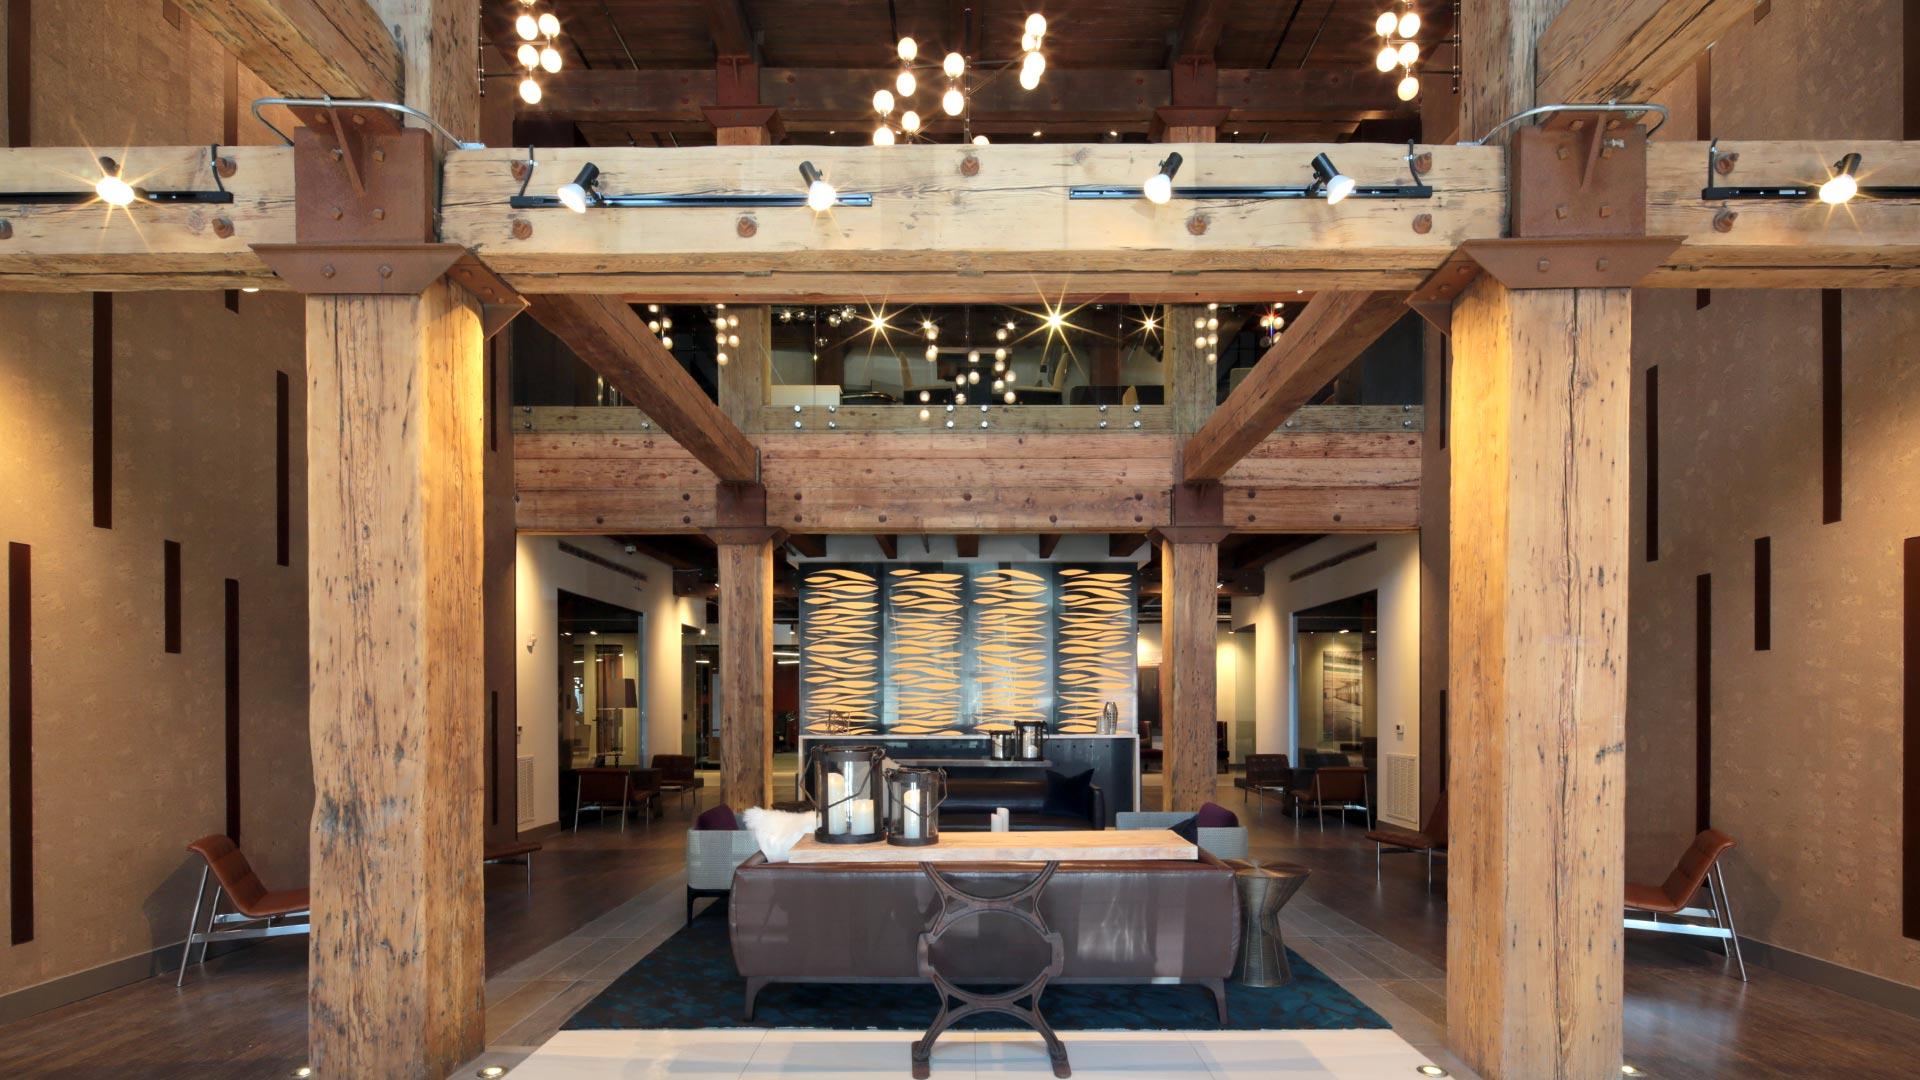 Architecture<br>Interiors<br>Planning